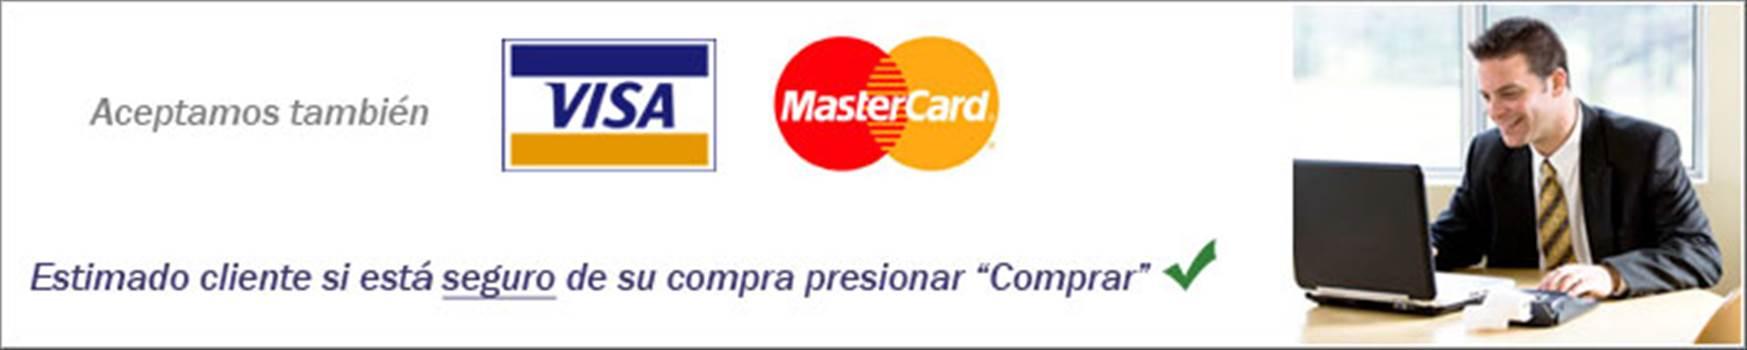 logo-tarjetas.jpg by erubio24